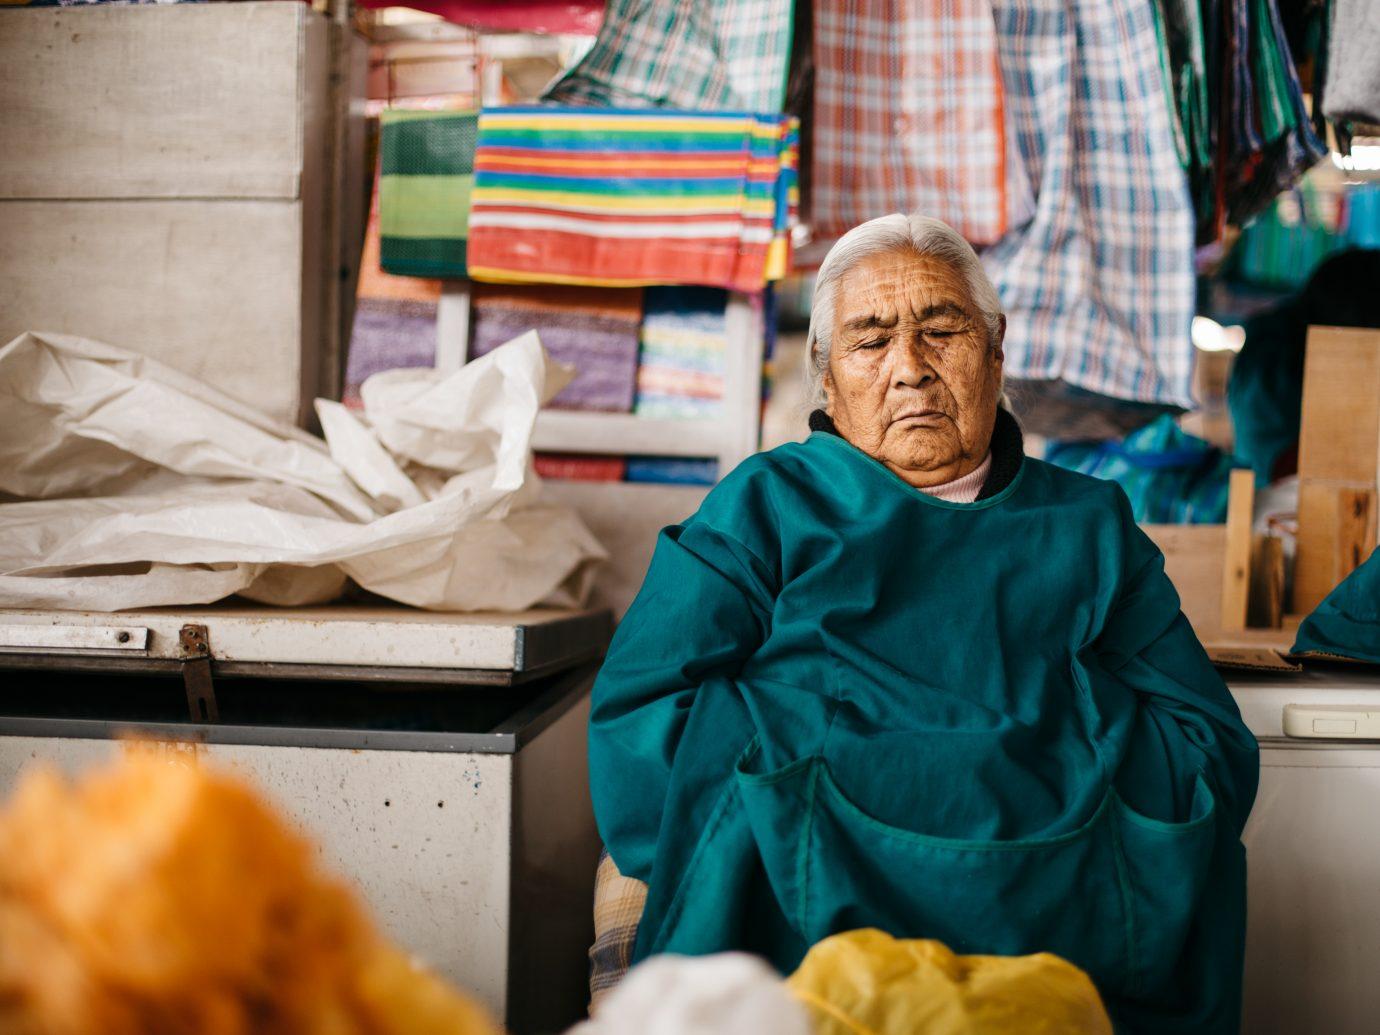 Peruvian man in emerald green outerwear resting